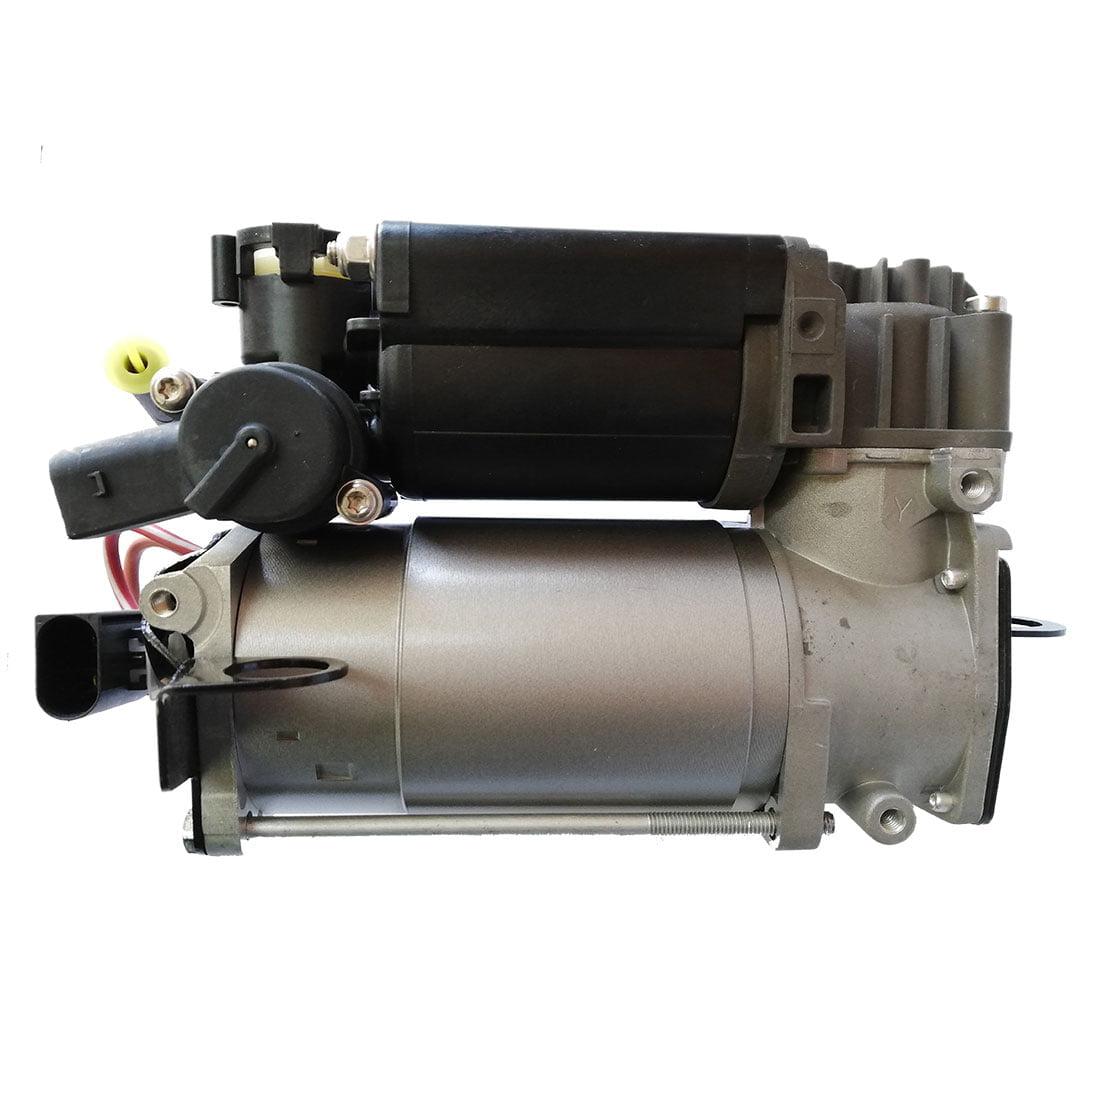 00006 Compresor De Suspension Neumatica Mercedes Clase S W220 Cls W219 E W211 Wagon A21132000304 A2203200104 1.jpg